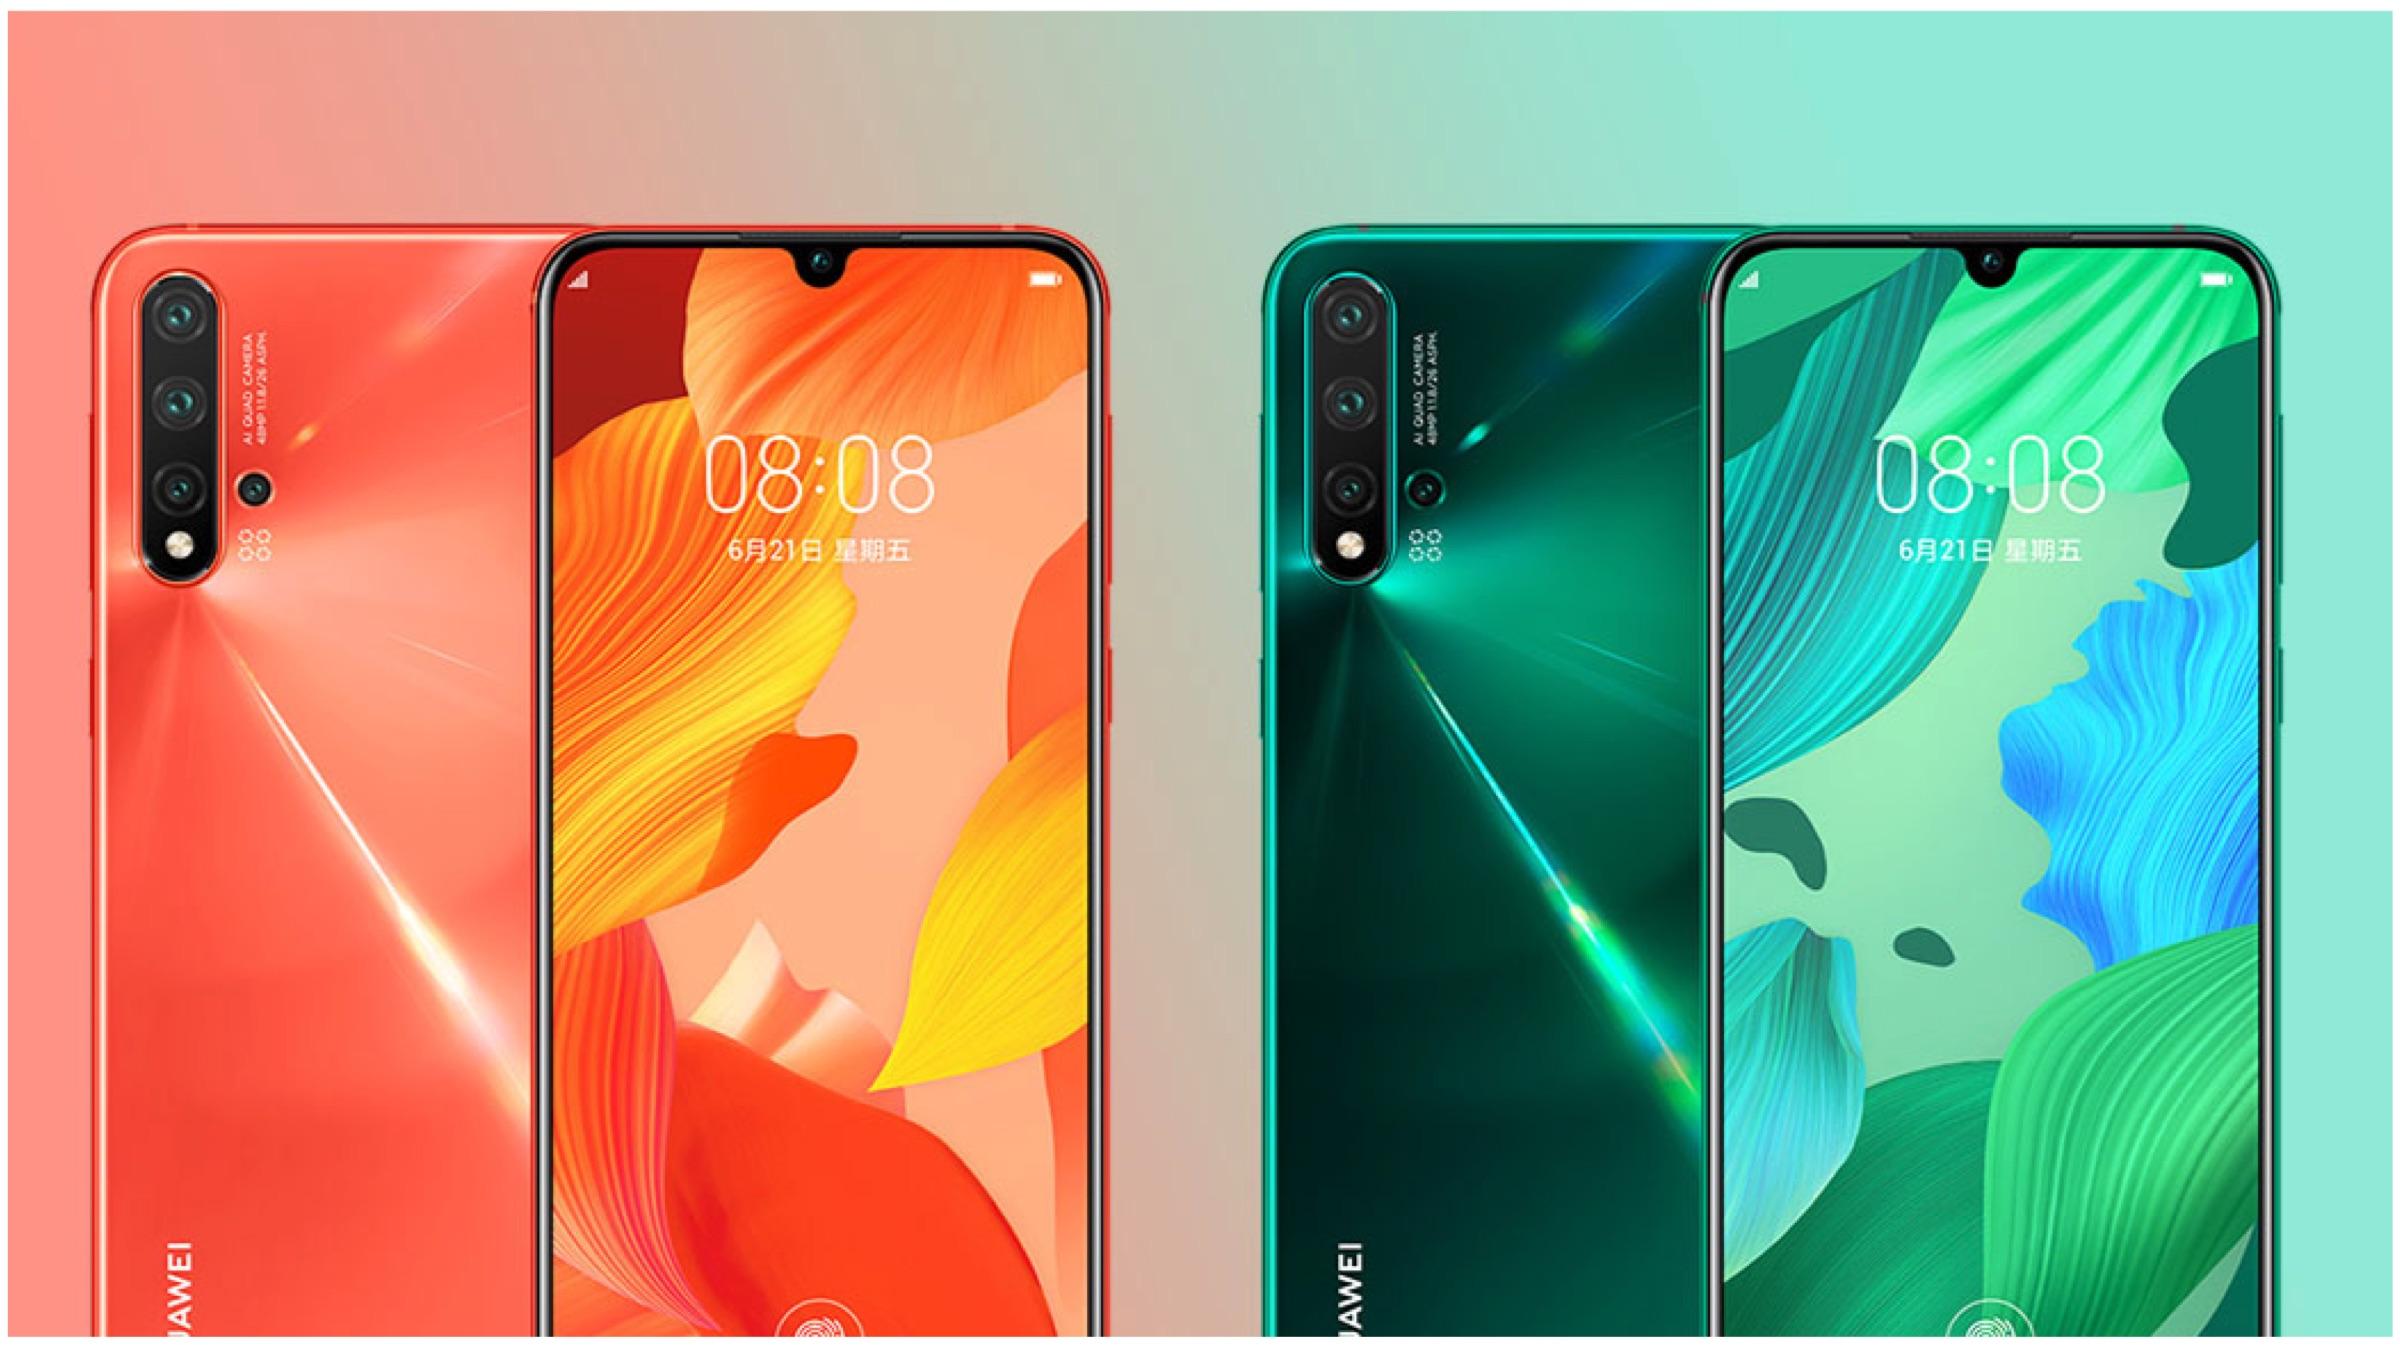 Huawei Nova 5 Pro With Kirin 810